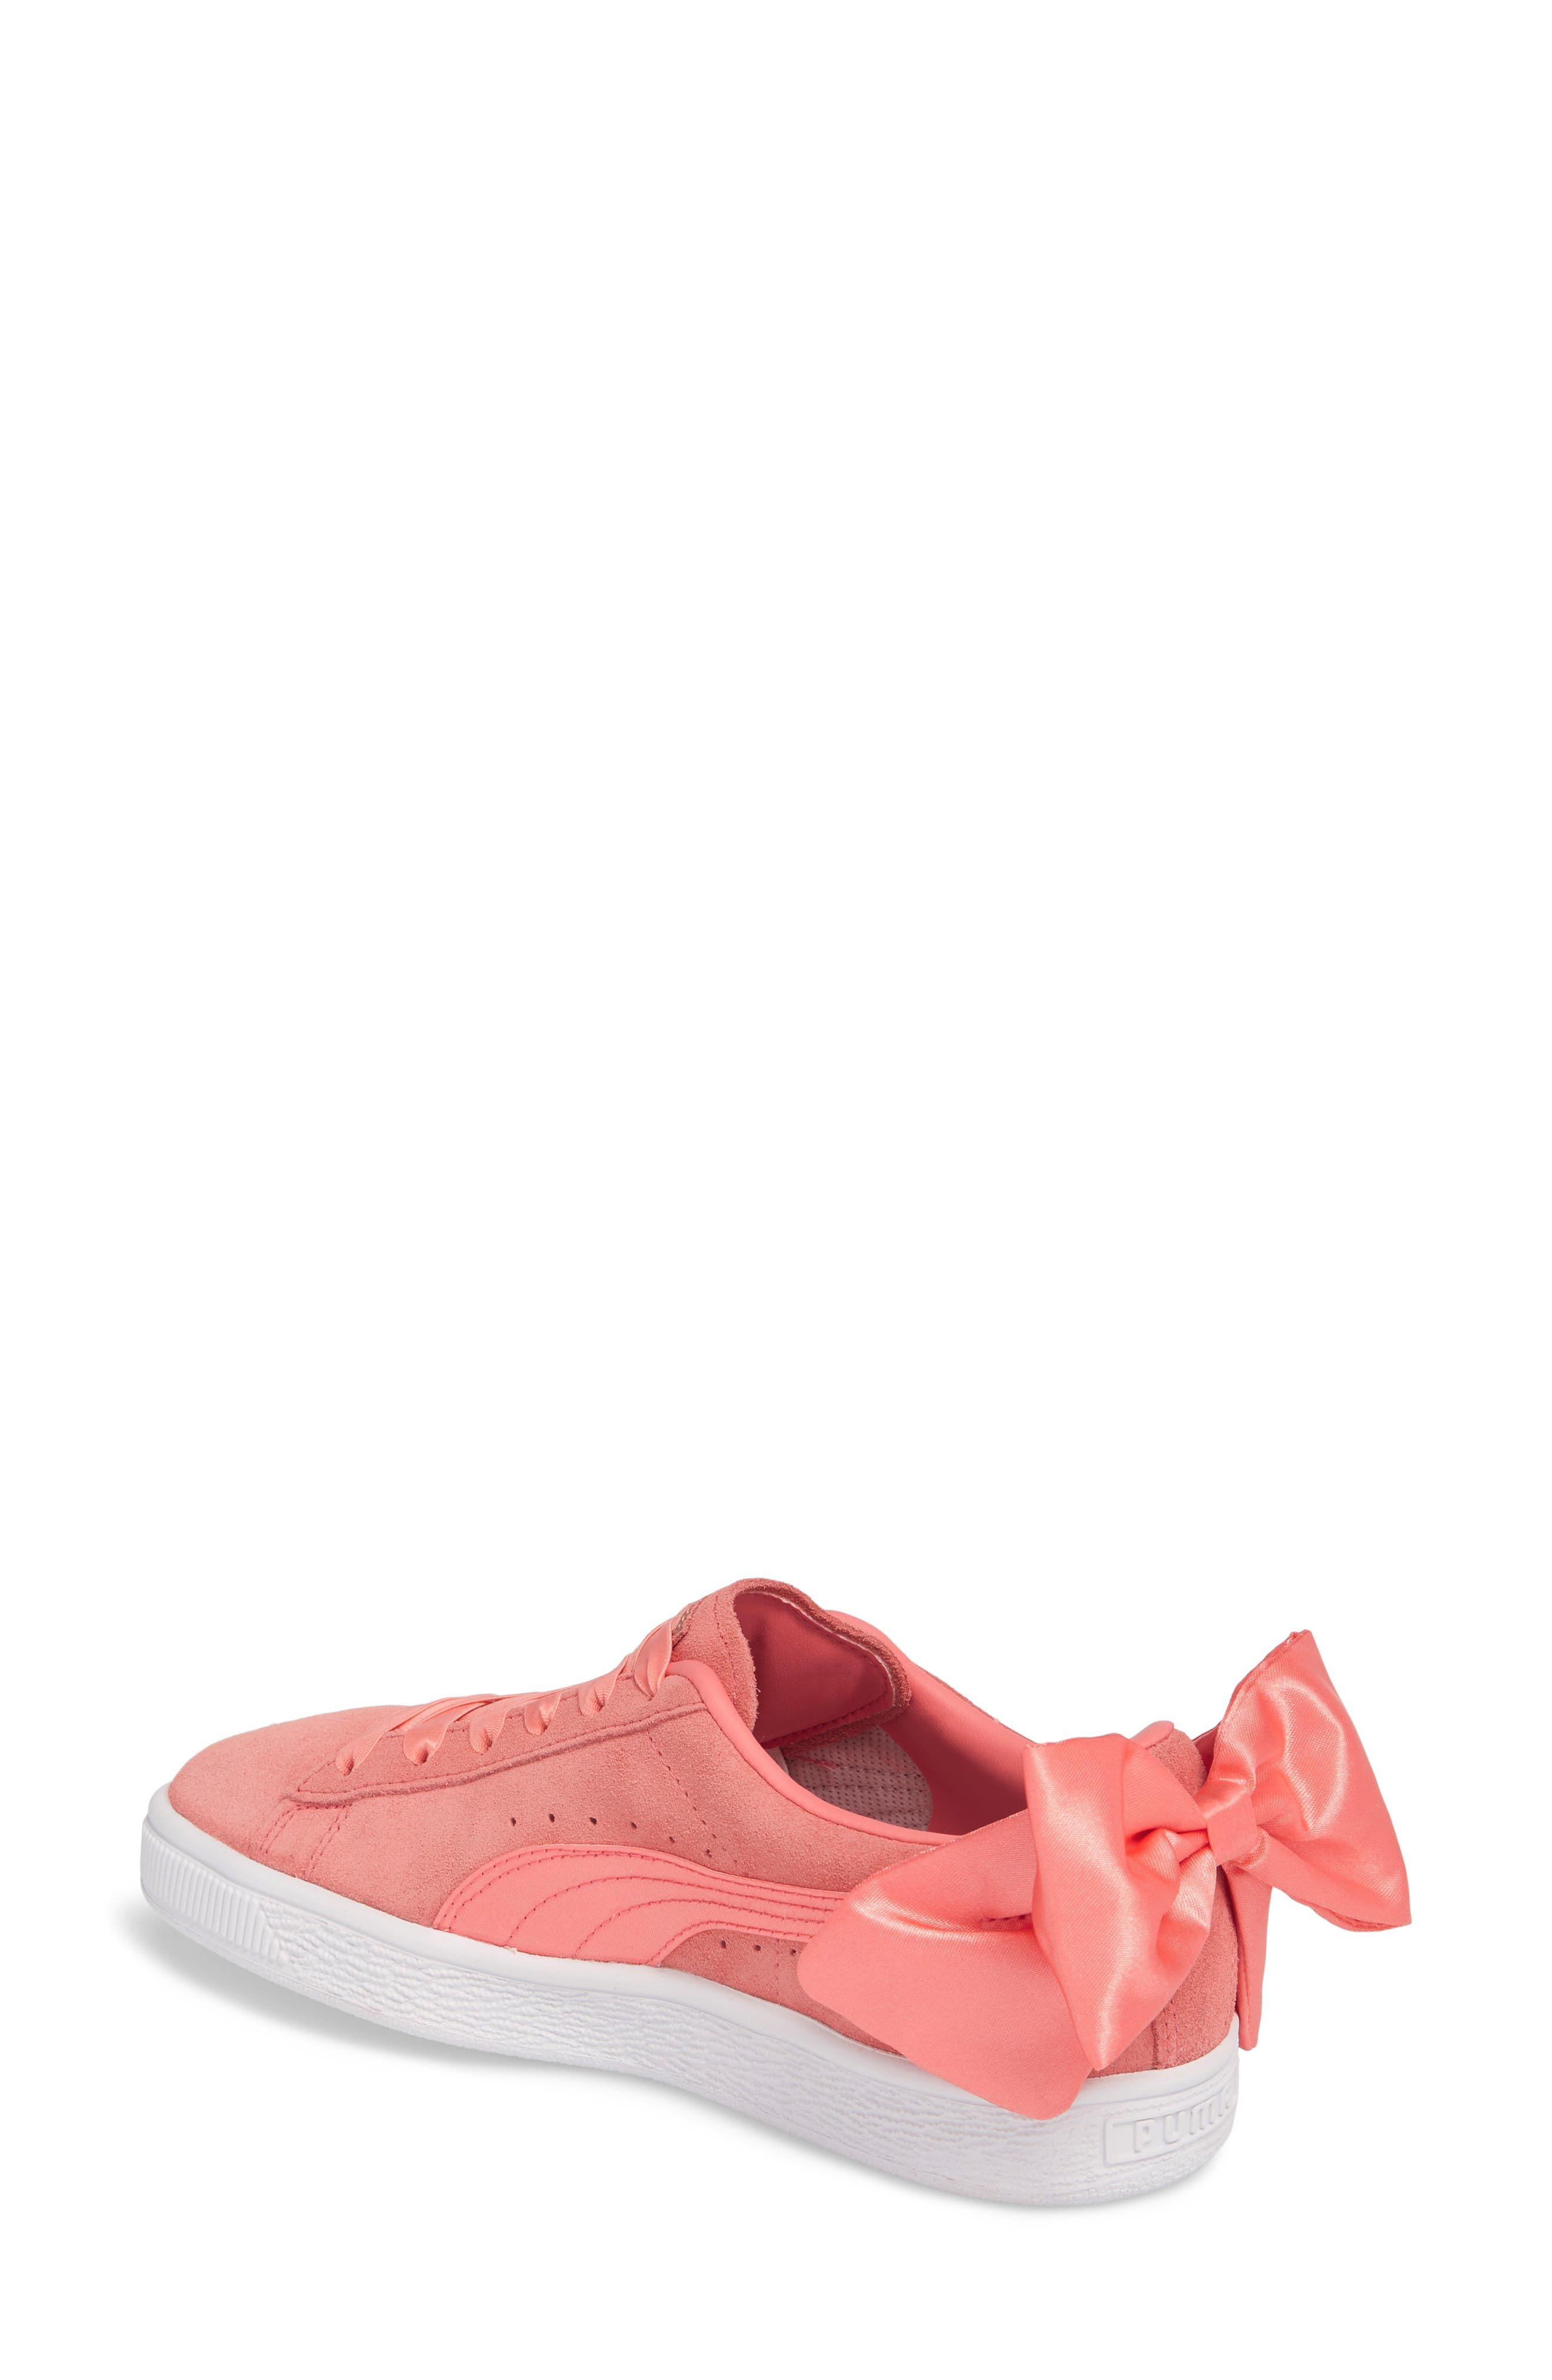 Bow Sneaker,                             Alternate thumbnail 6, color,